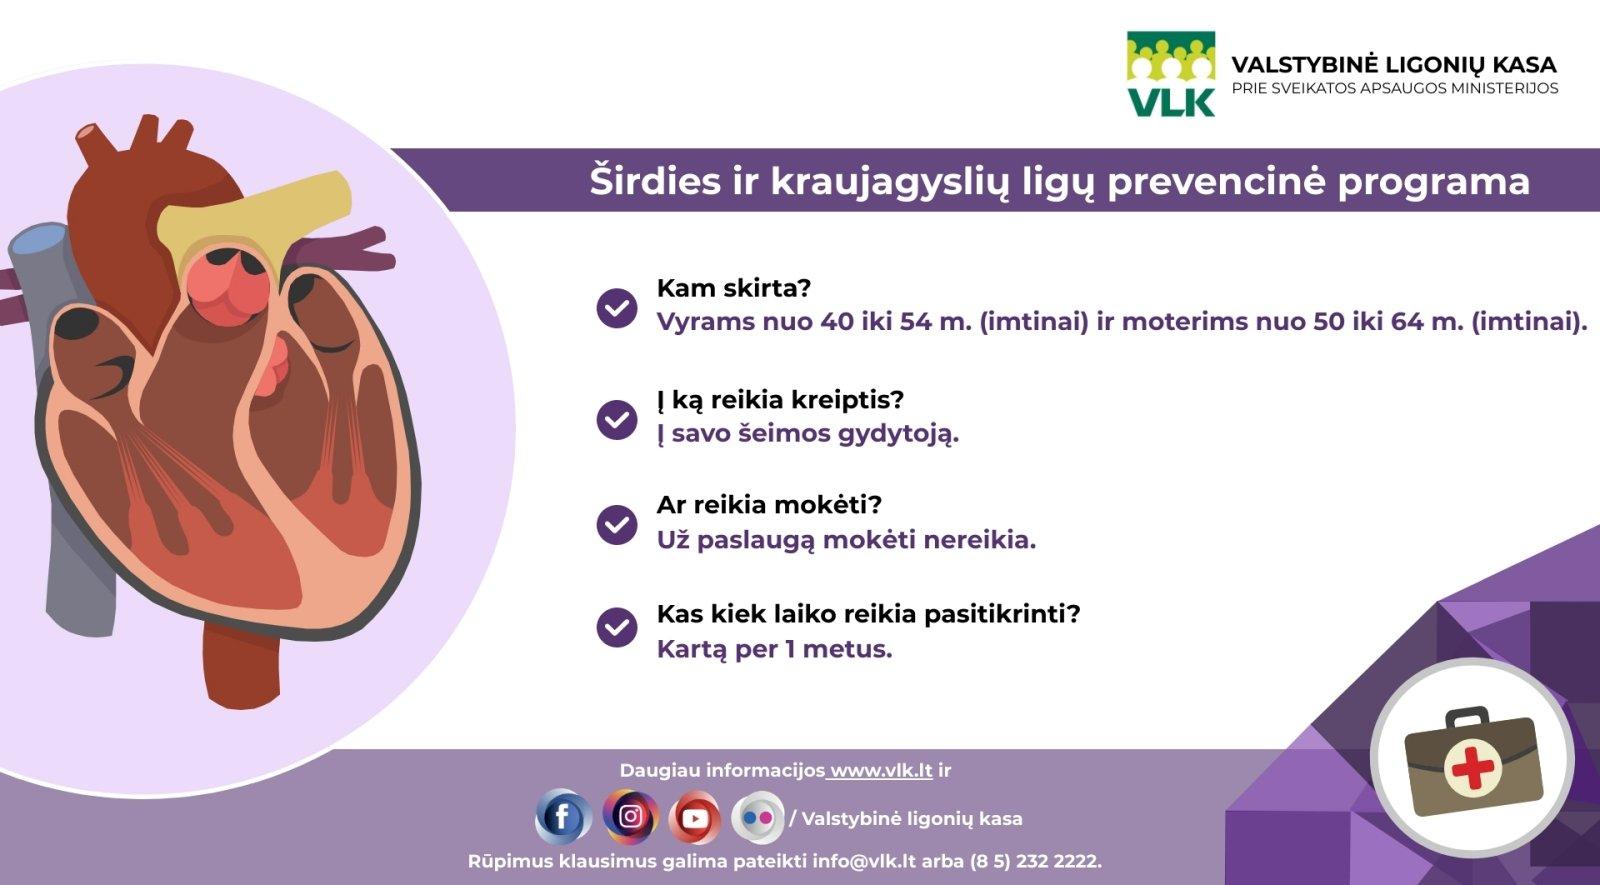 hipertenzija gydant bradikardiją vaikino hipertenzija